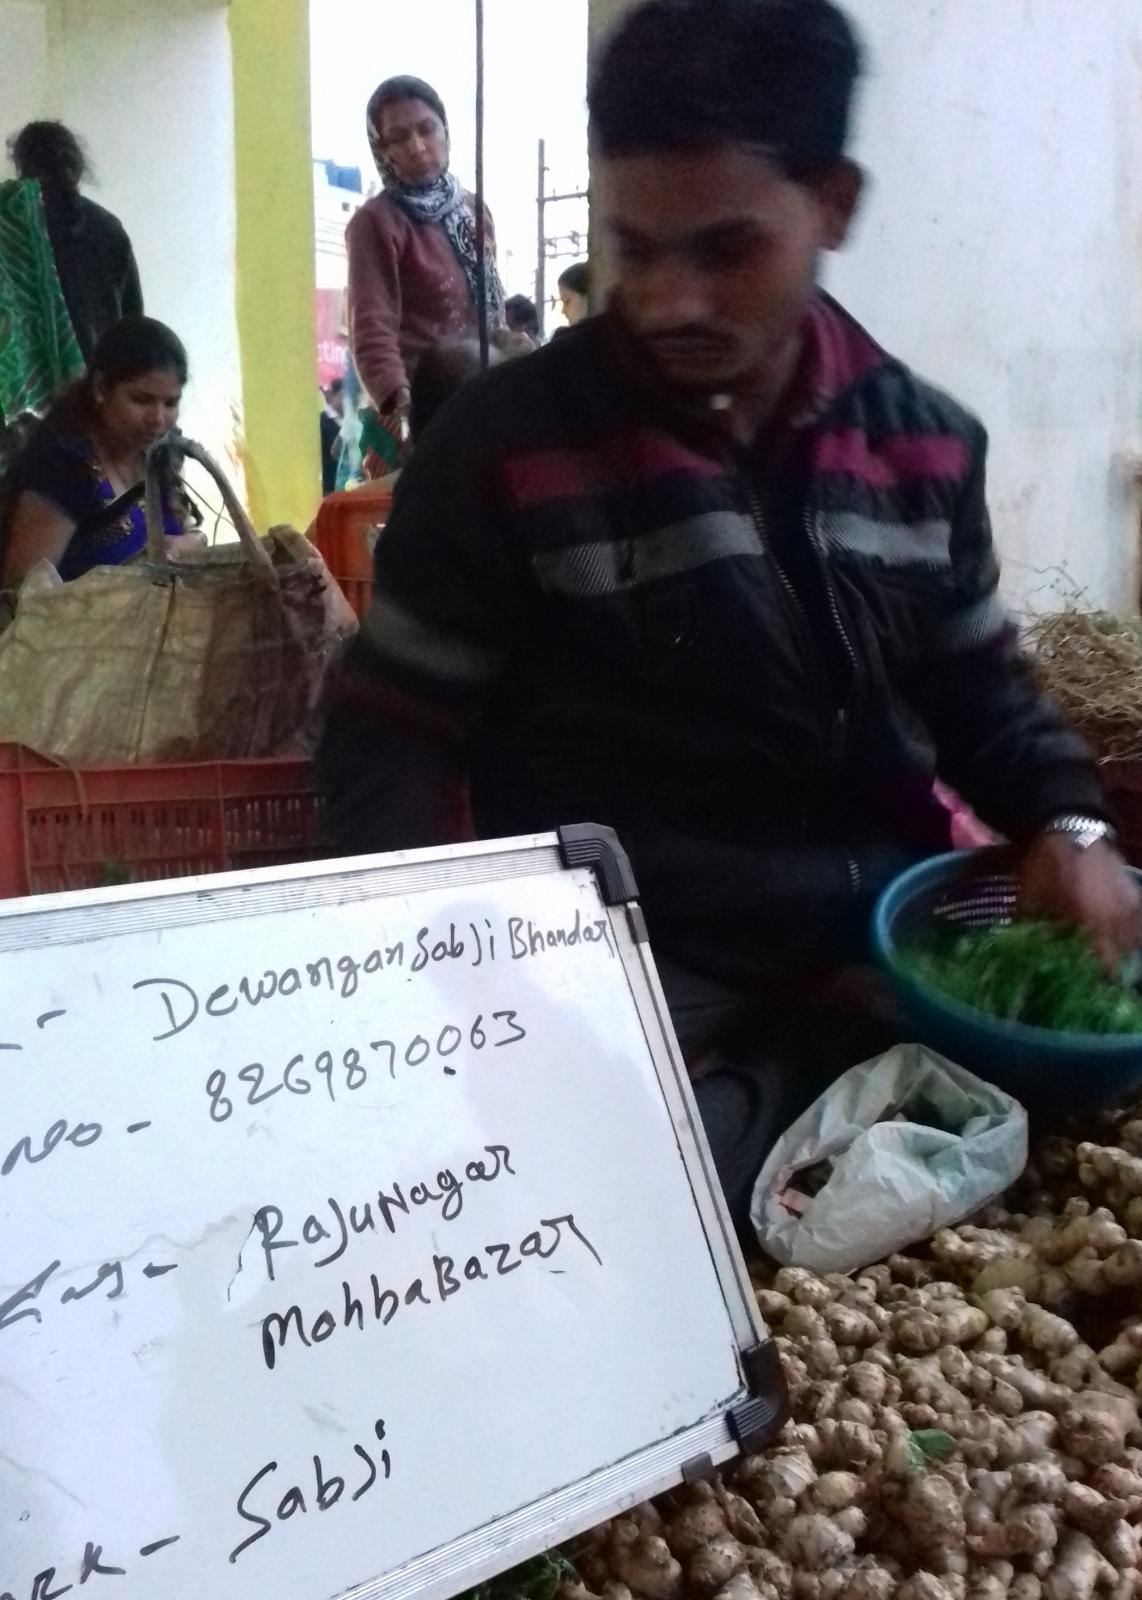 Dewangan Sabji Bhandar